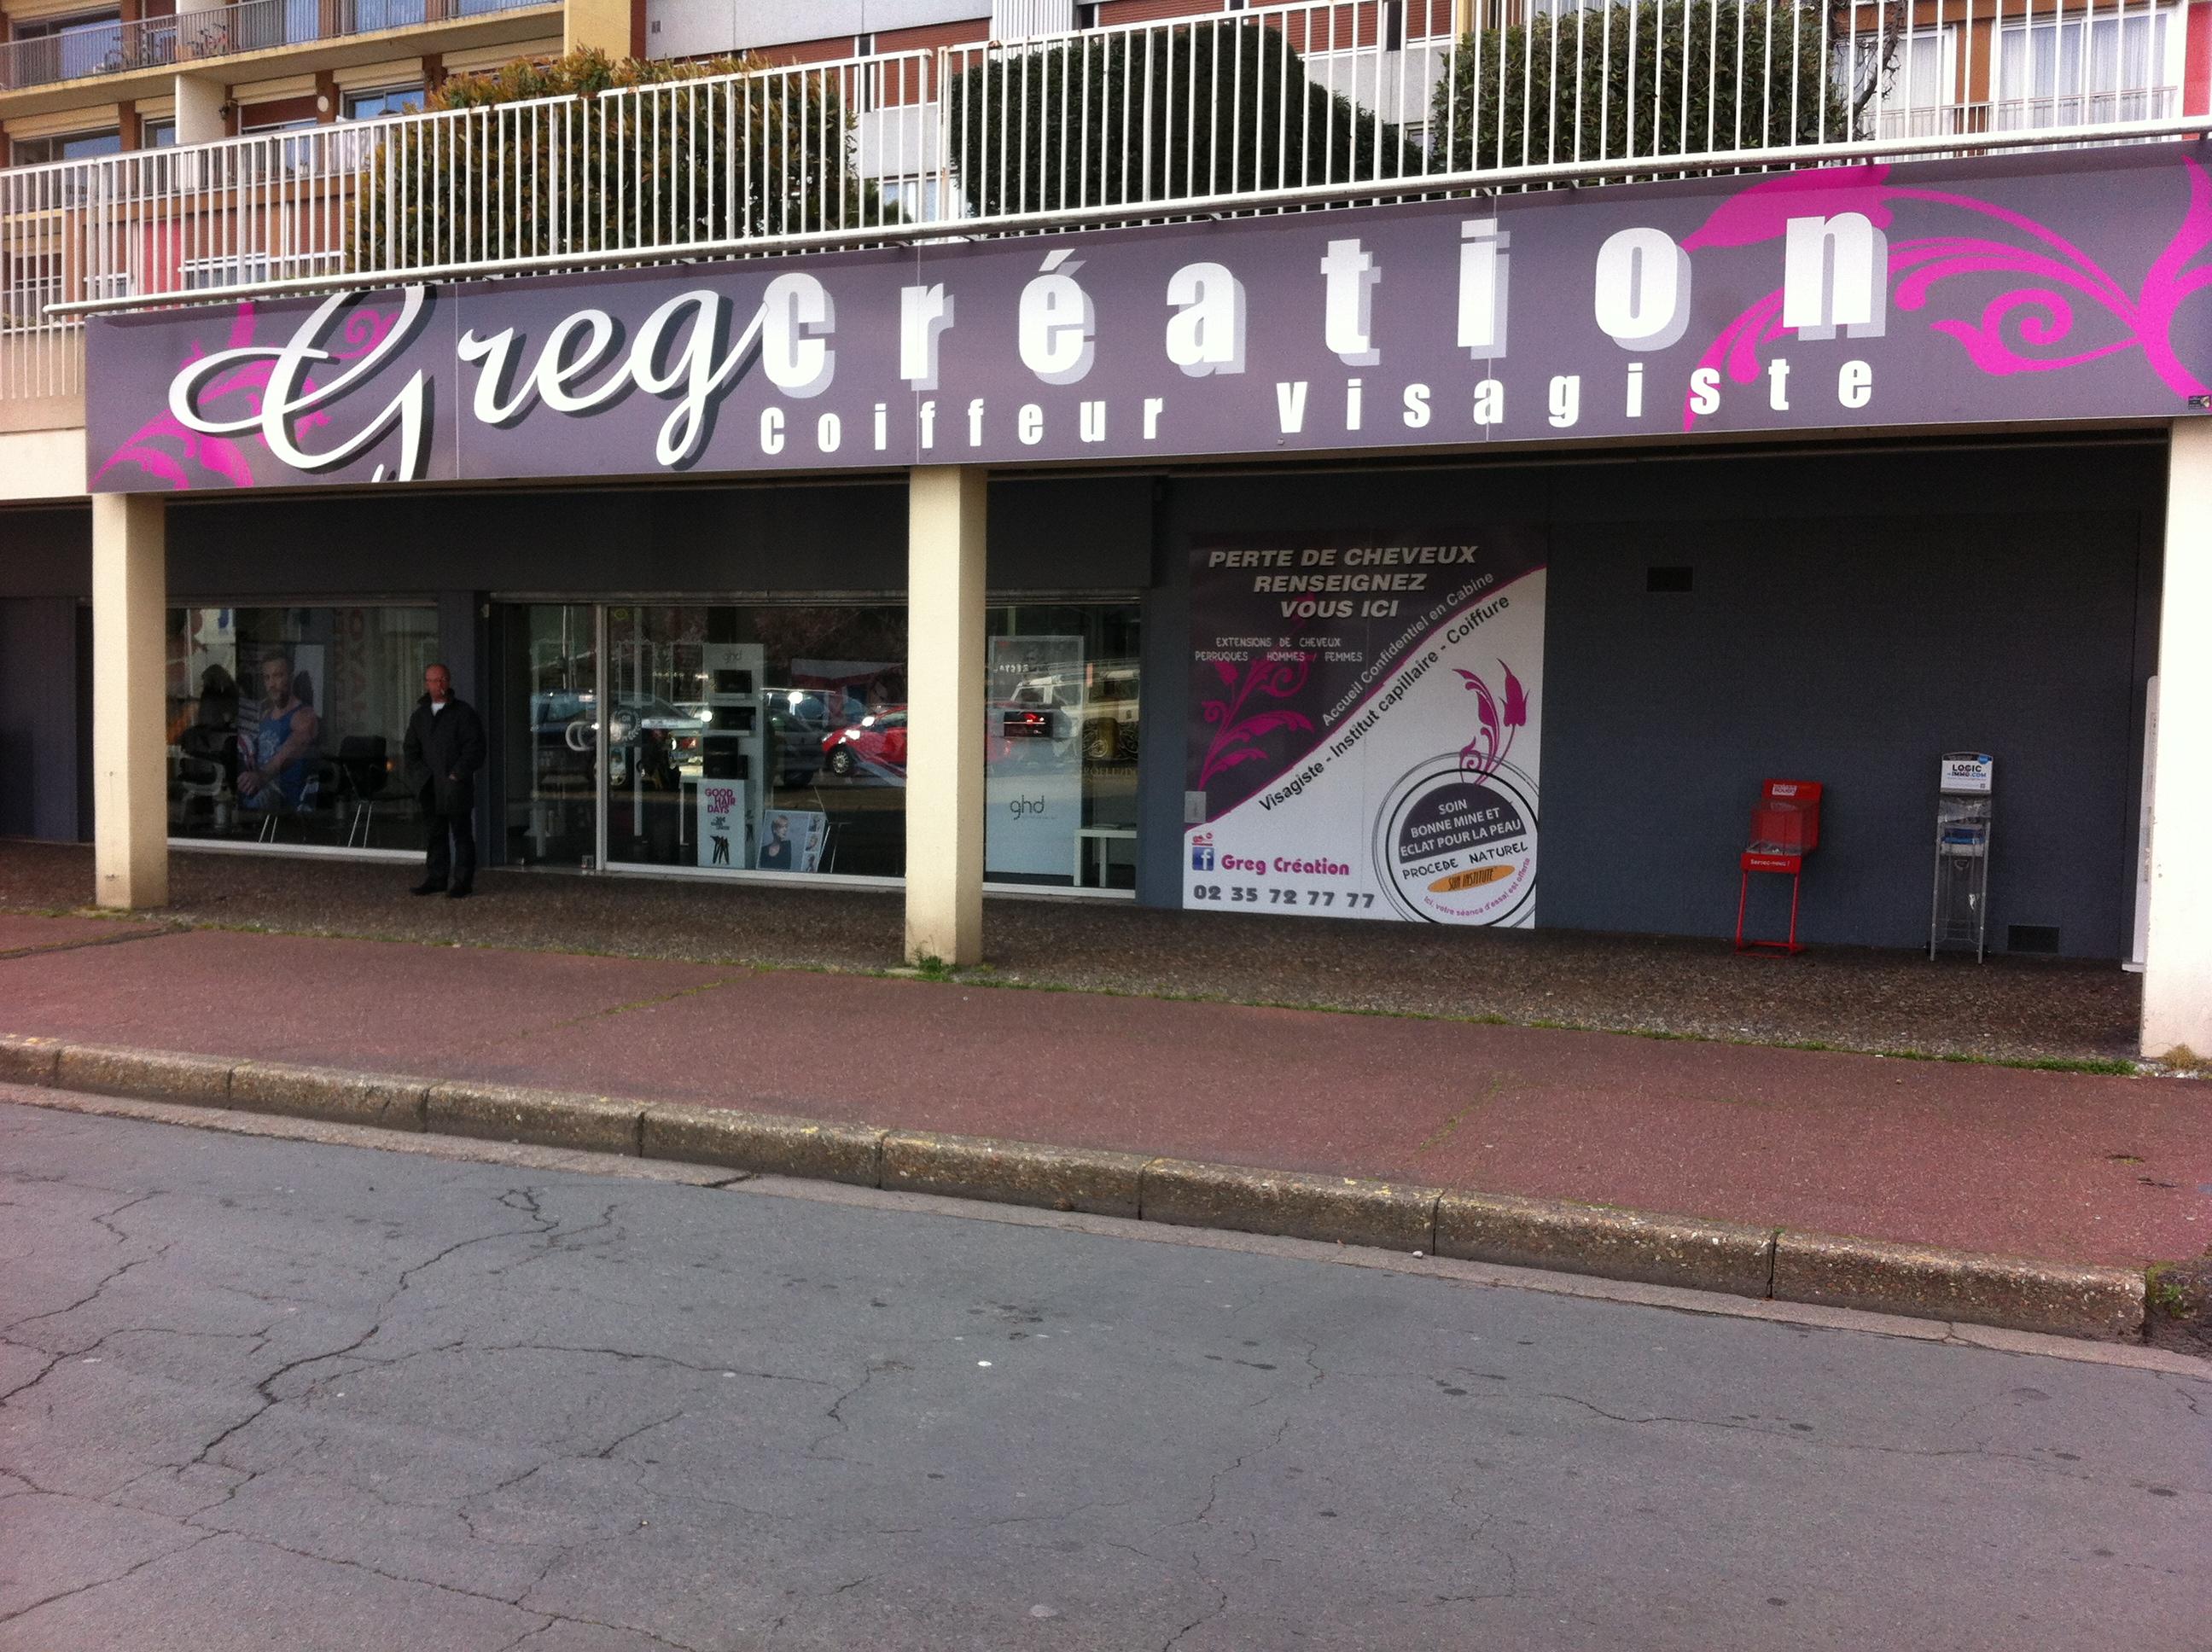 Greg cr ation sotteville l s rouen avis tarifs for Le garage rouen tarifs